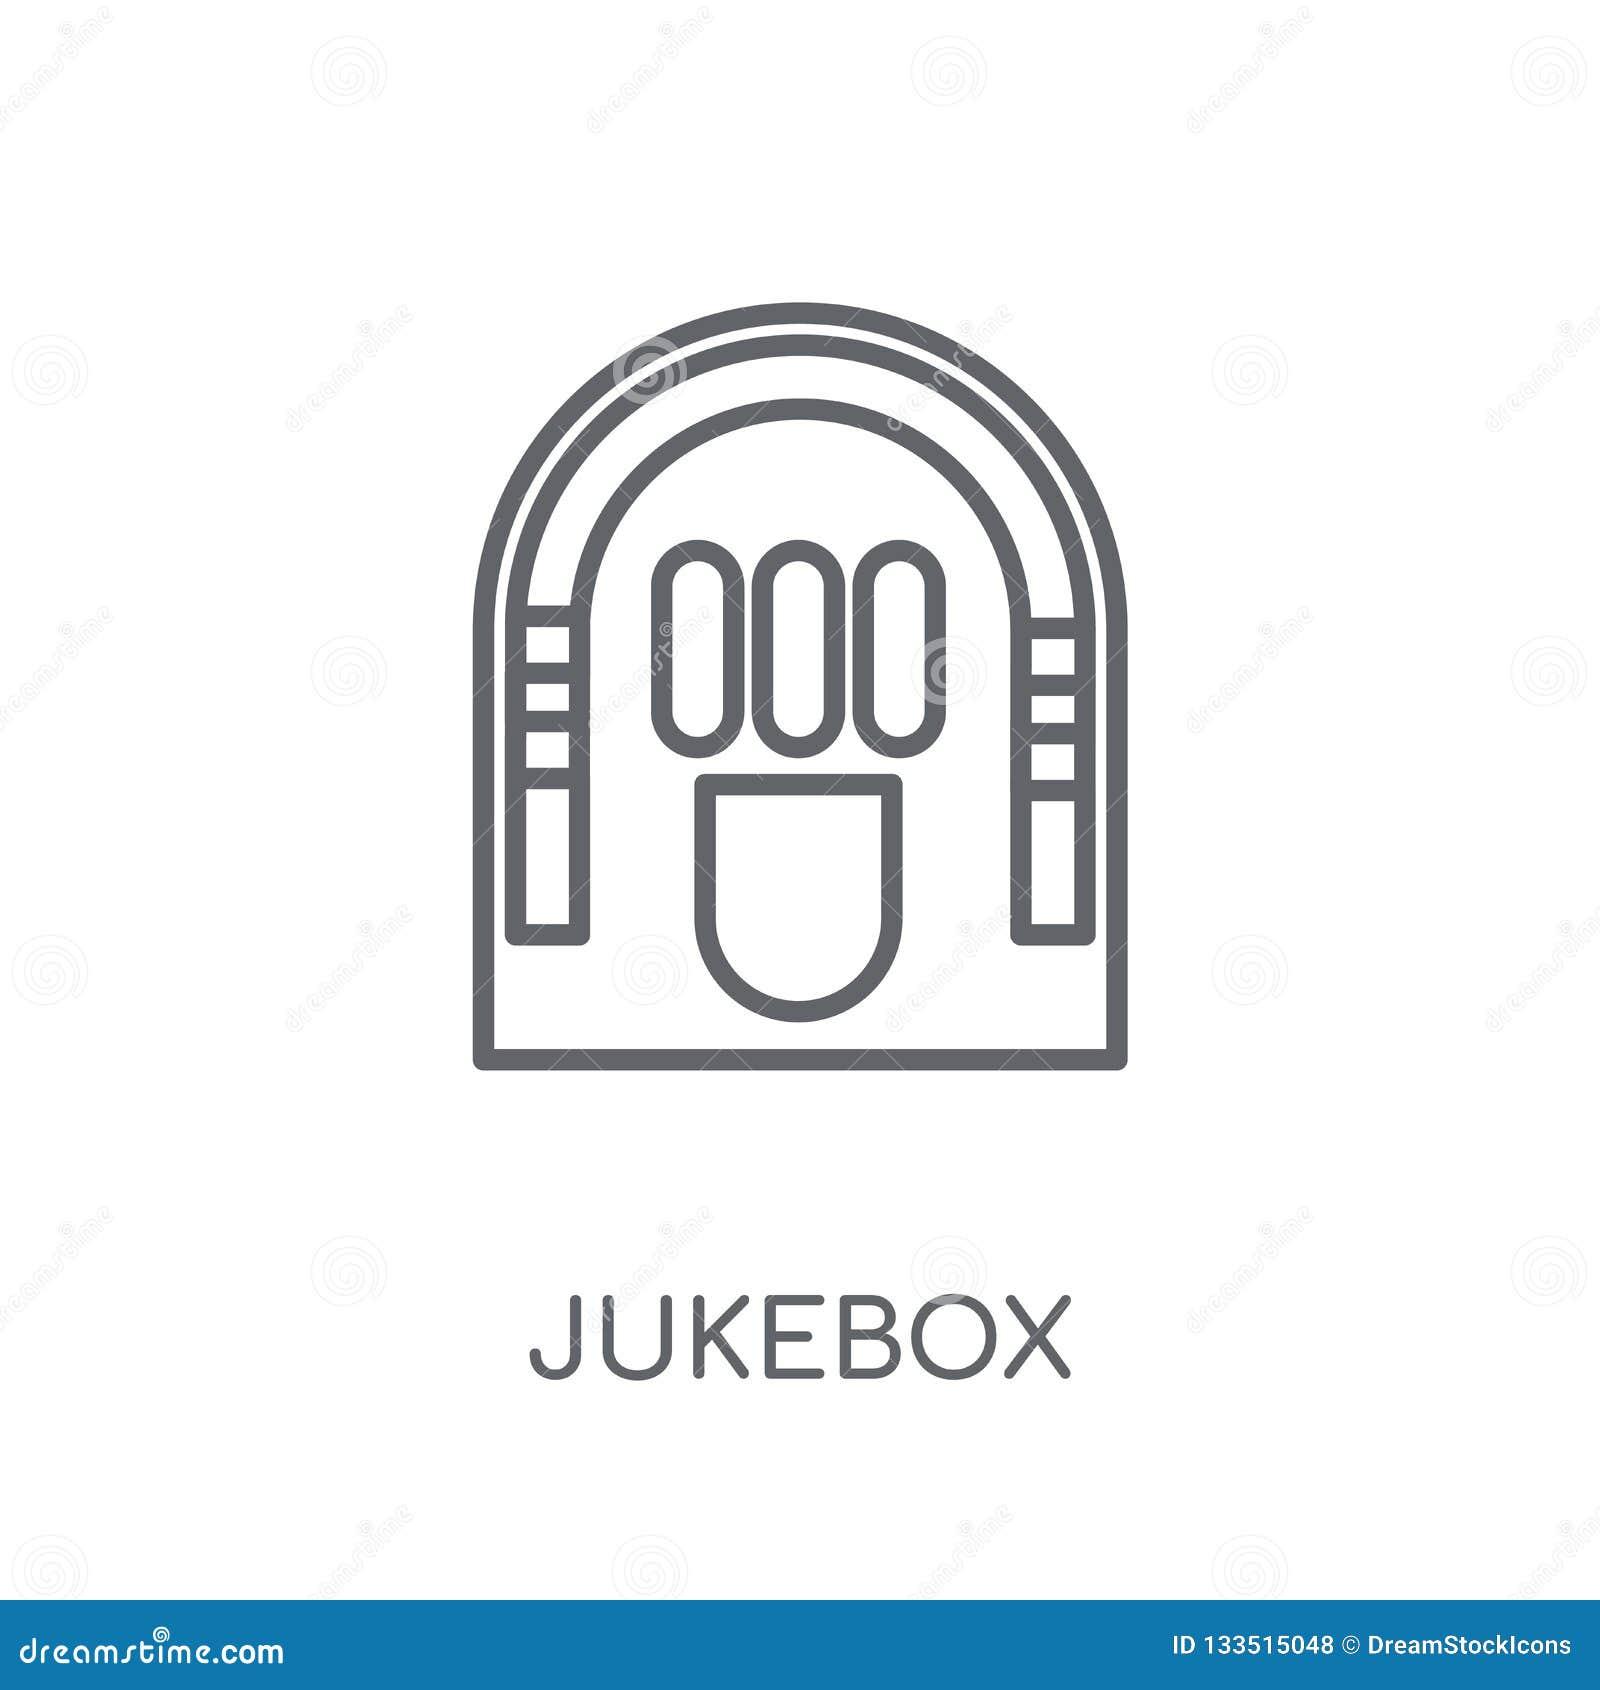 Jukebox linear icon. Modern outline Jukebox logo concept on whit